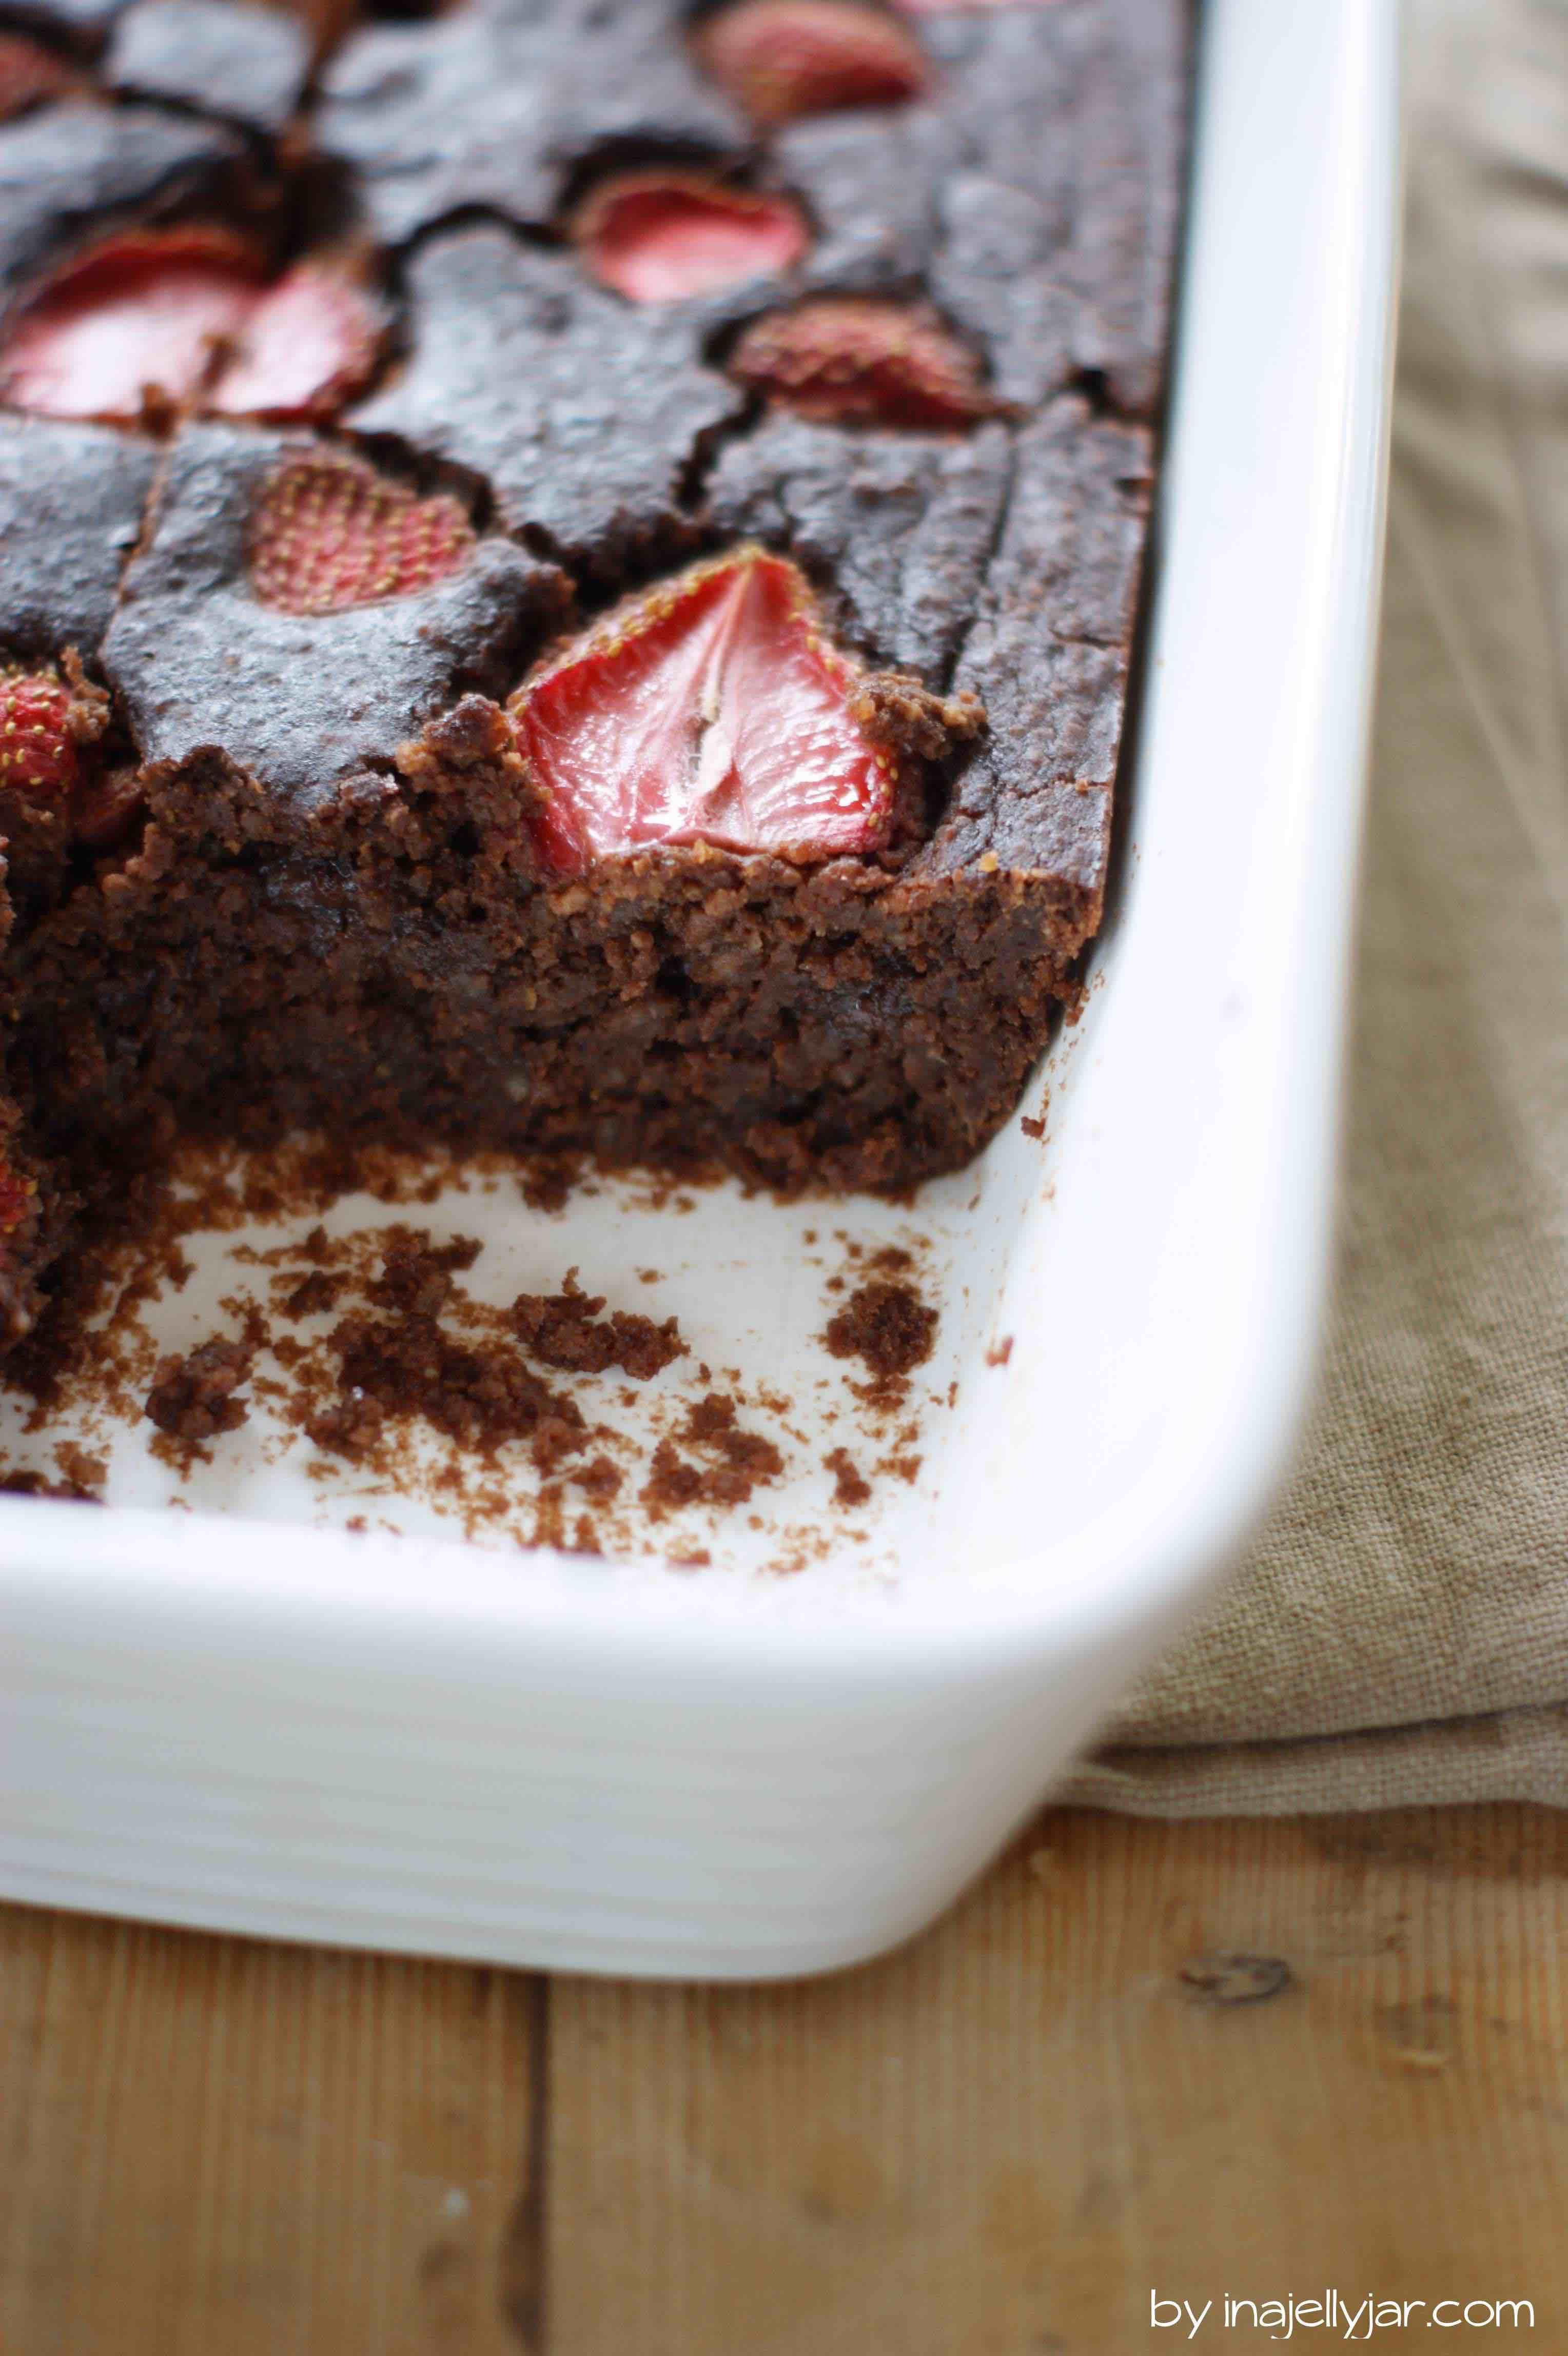 Glutenfreie Kichererbsen-Brownies mit Erdbeeren